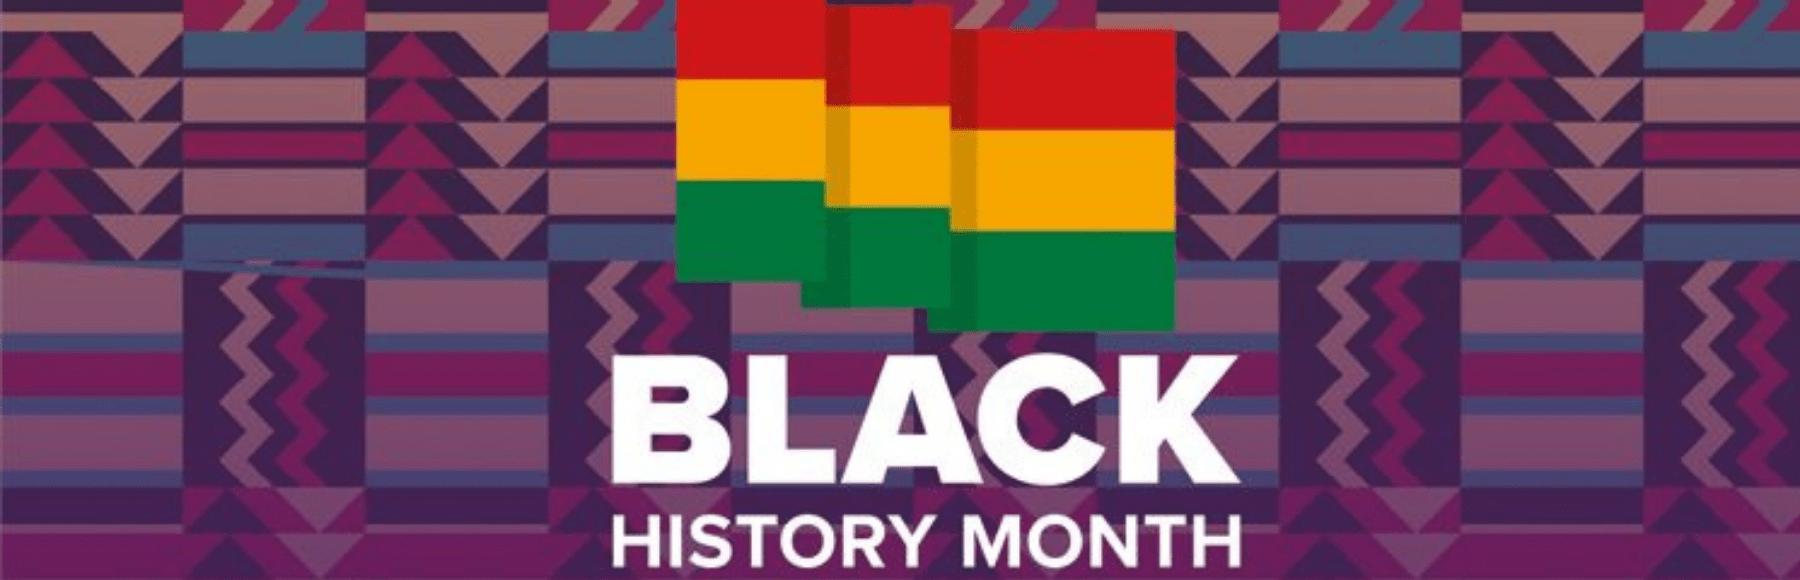 Black history month sheffield